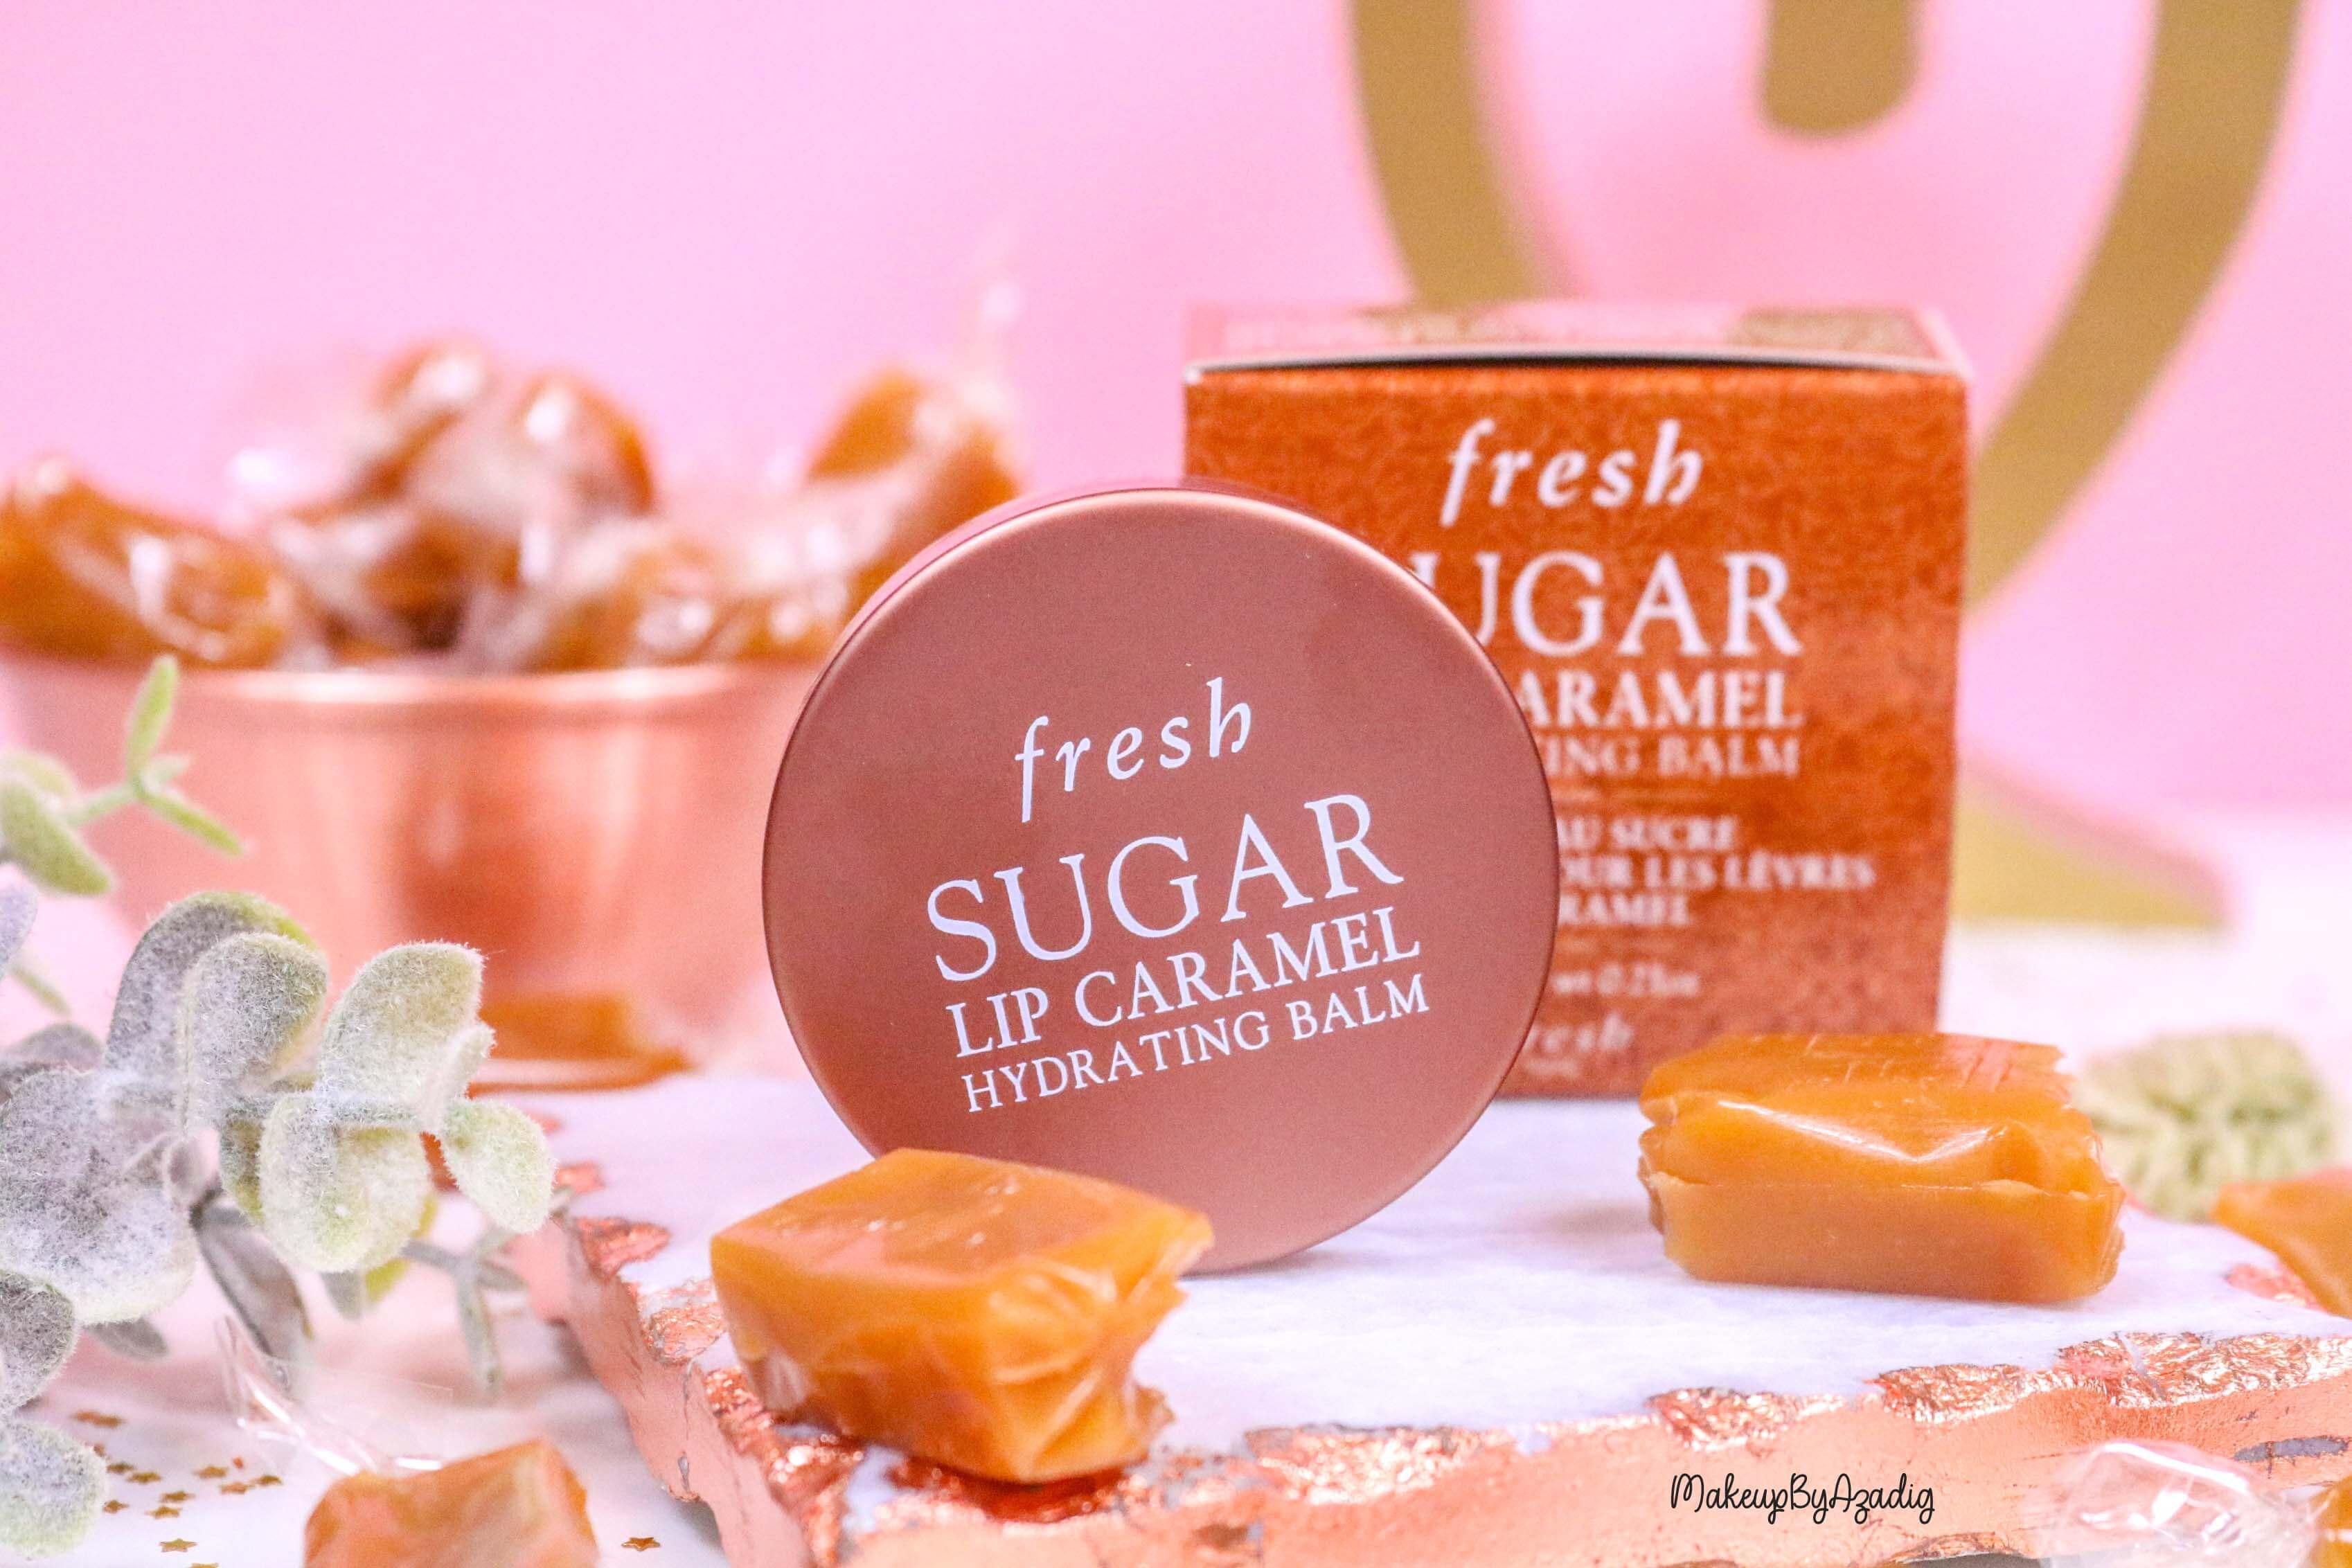 revue-baume-sucre-fresh-beauty-skincare-caramel-sugar-lip-caramel-sephora-makeupbyazadig-avis-prix-balm-peche